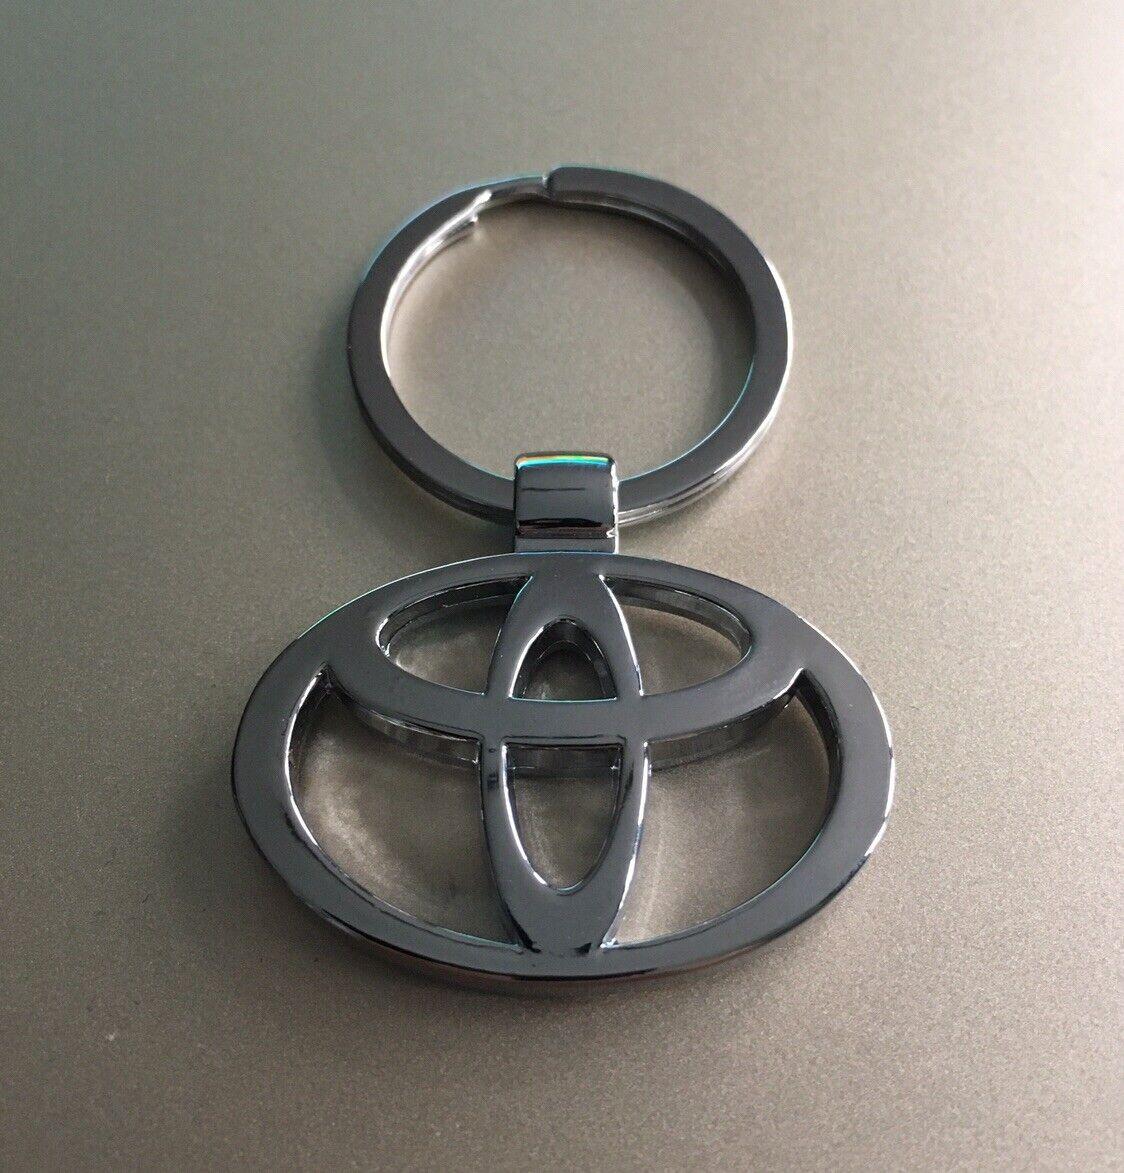 'TOYOTA' Keyring Chrome Keychain Official Logo Silver Key Ring Car Metal Chain